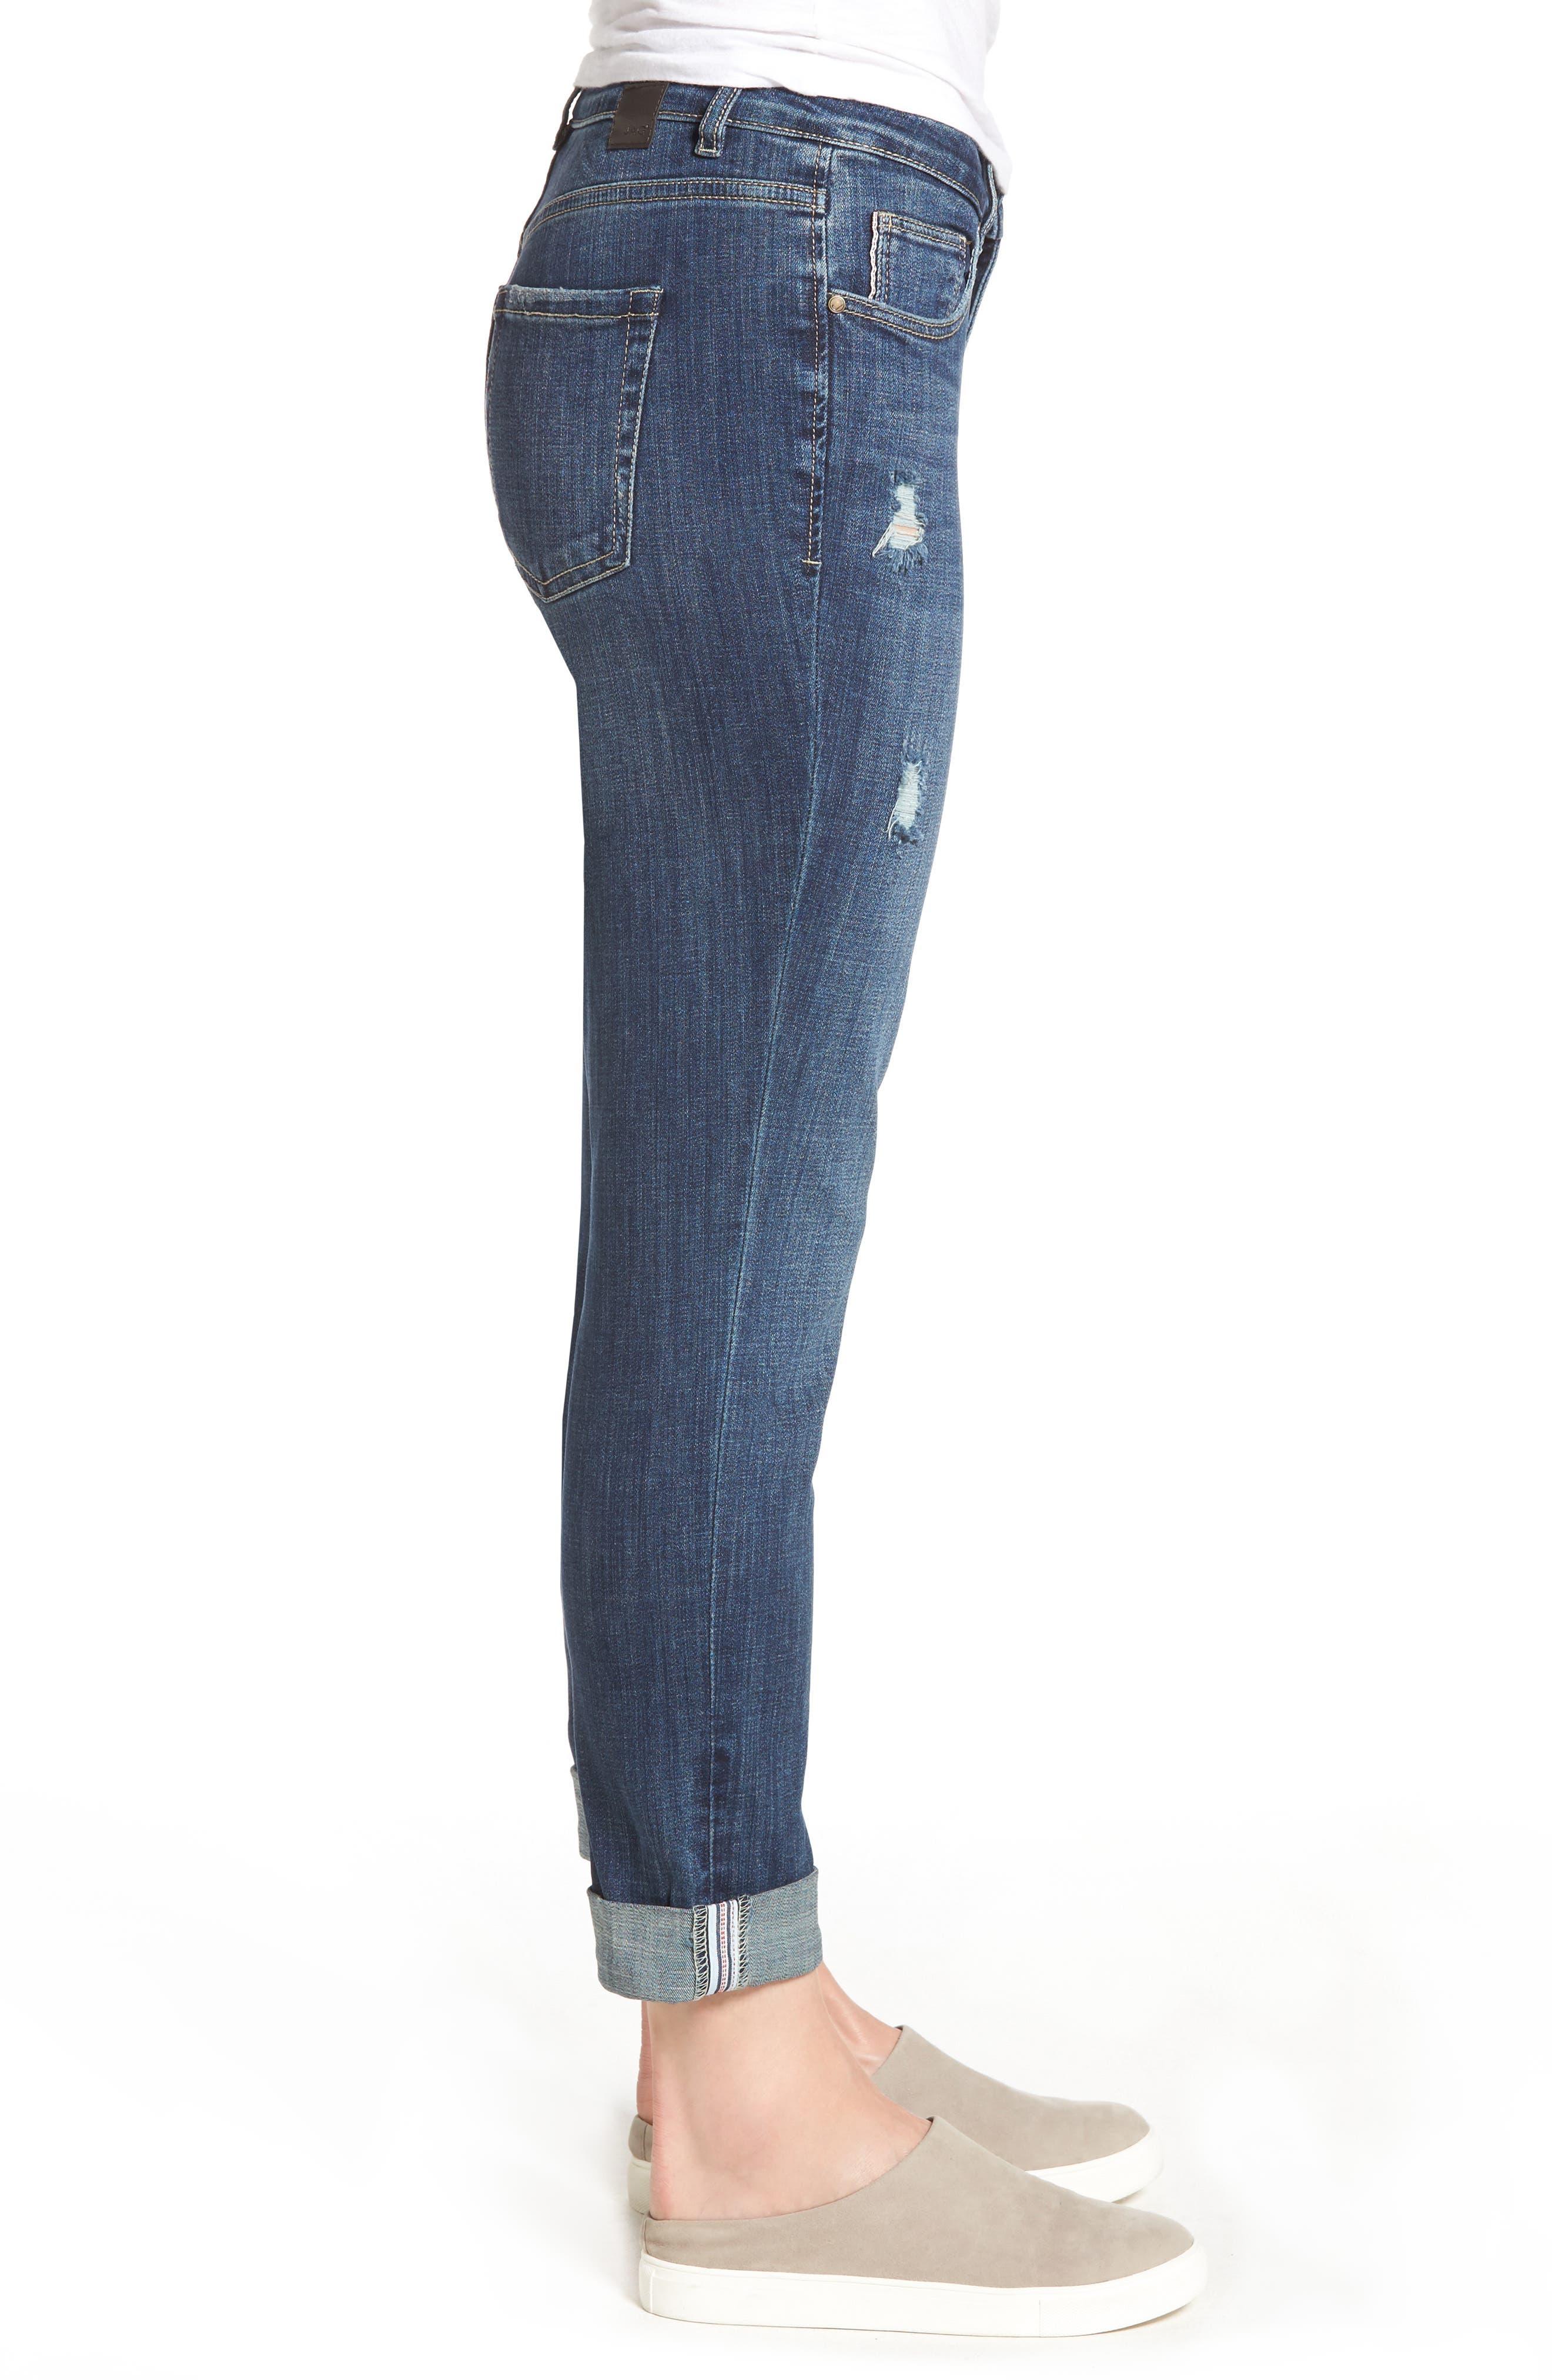 Carter Cuffed Stretch Girlfriend Jeans,                             Alternate thumbnail 3, color,                             MEDIUM INDIGO